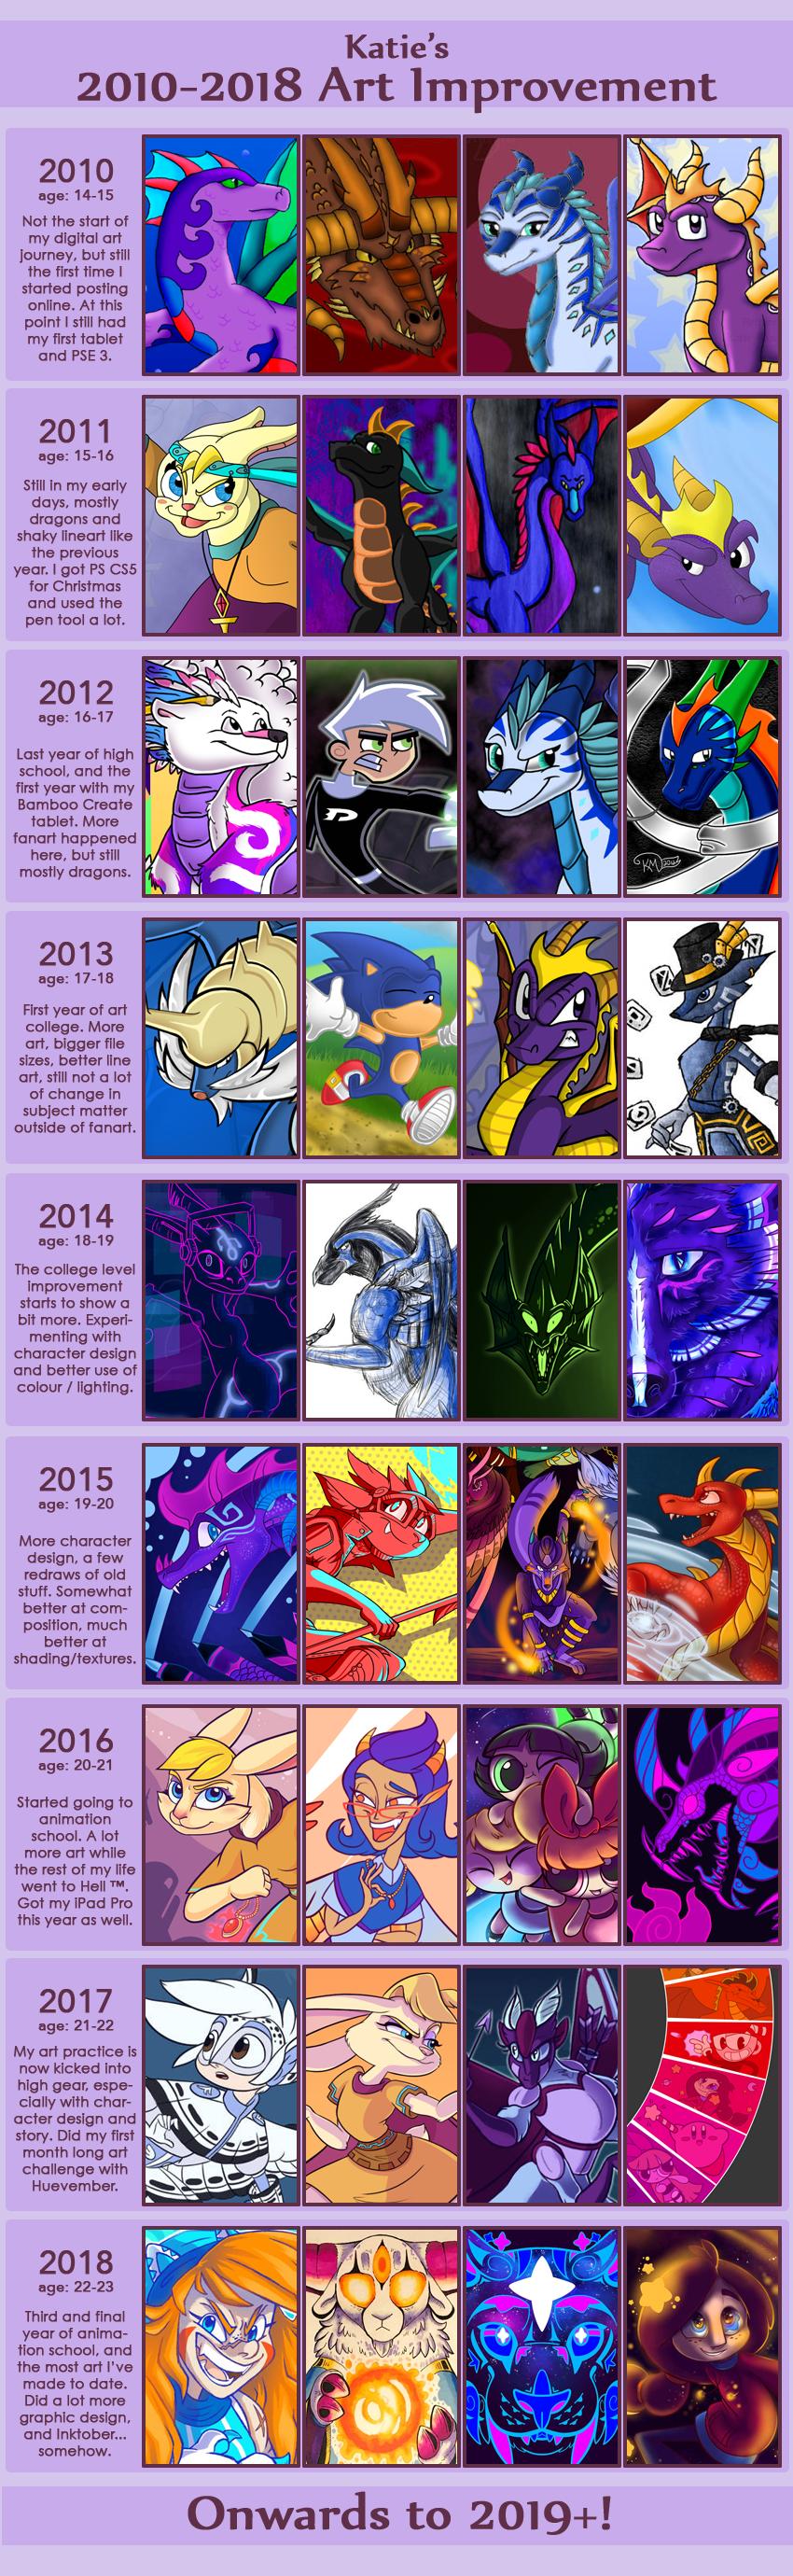 2010-2018 Art Improvement